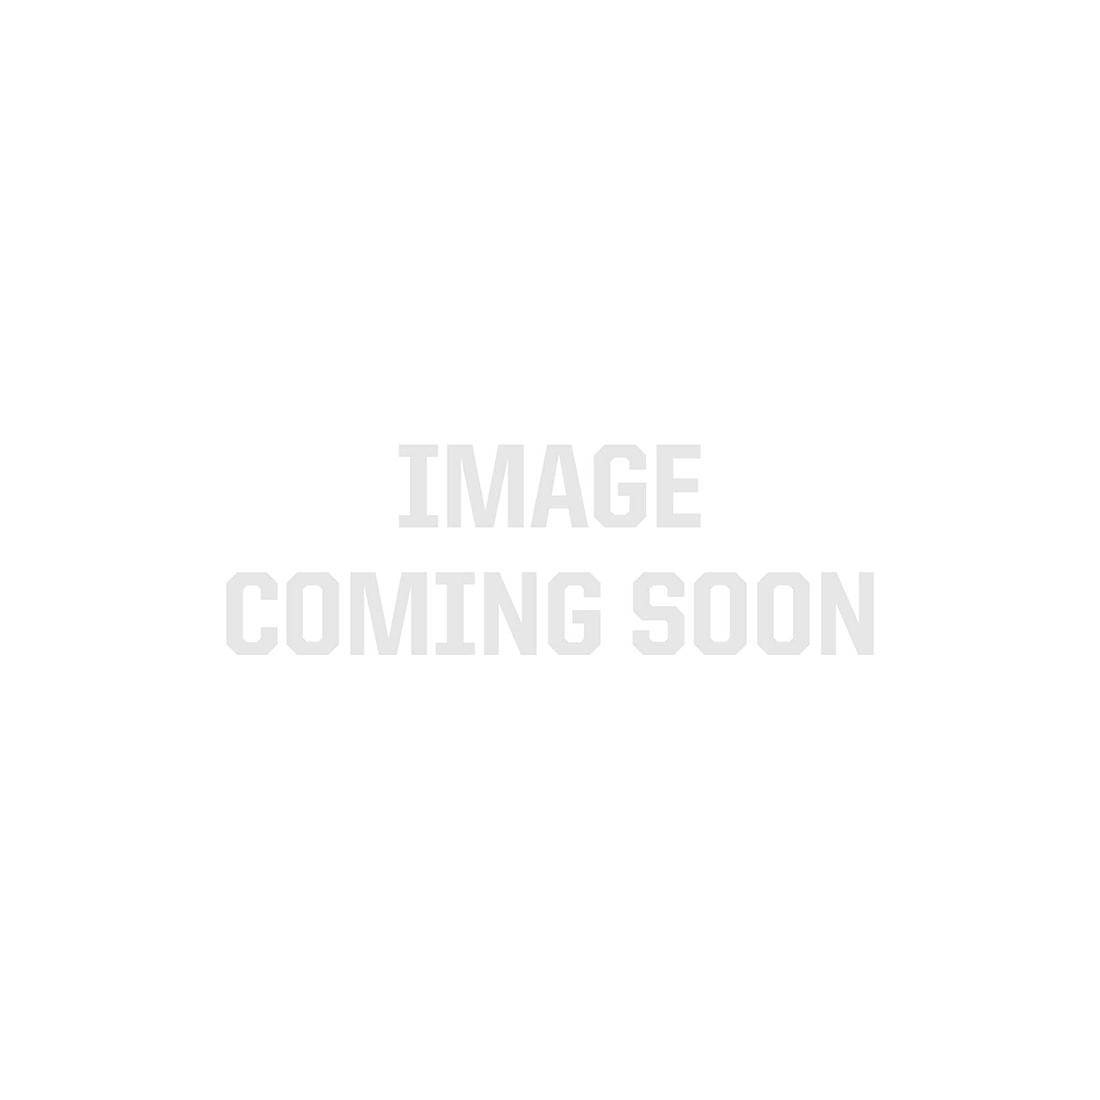 Kichler Design Pro LED Interconnect (10 feet long) (White) (Optional)